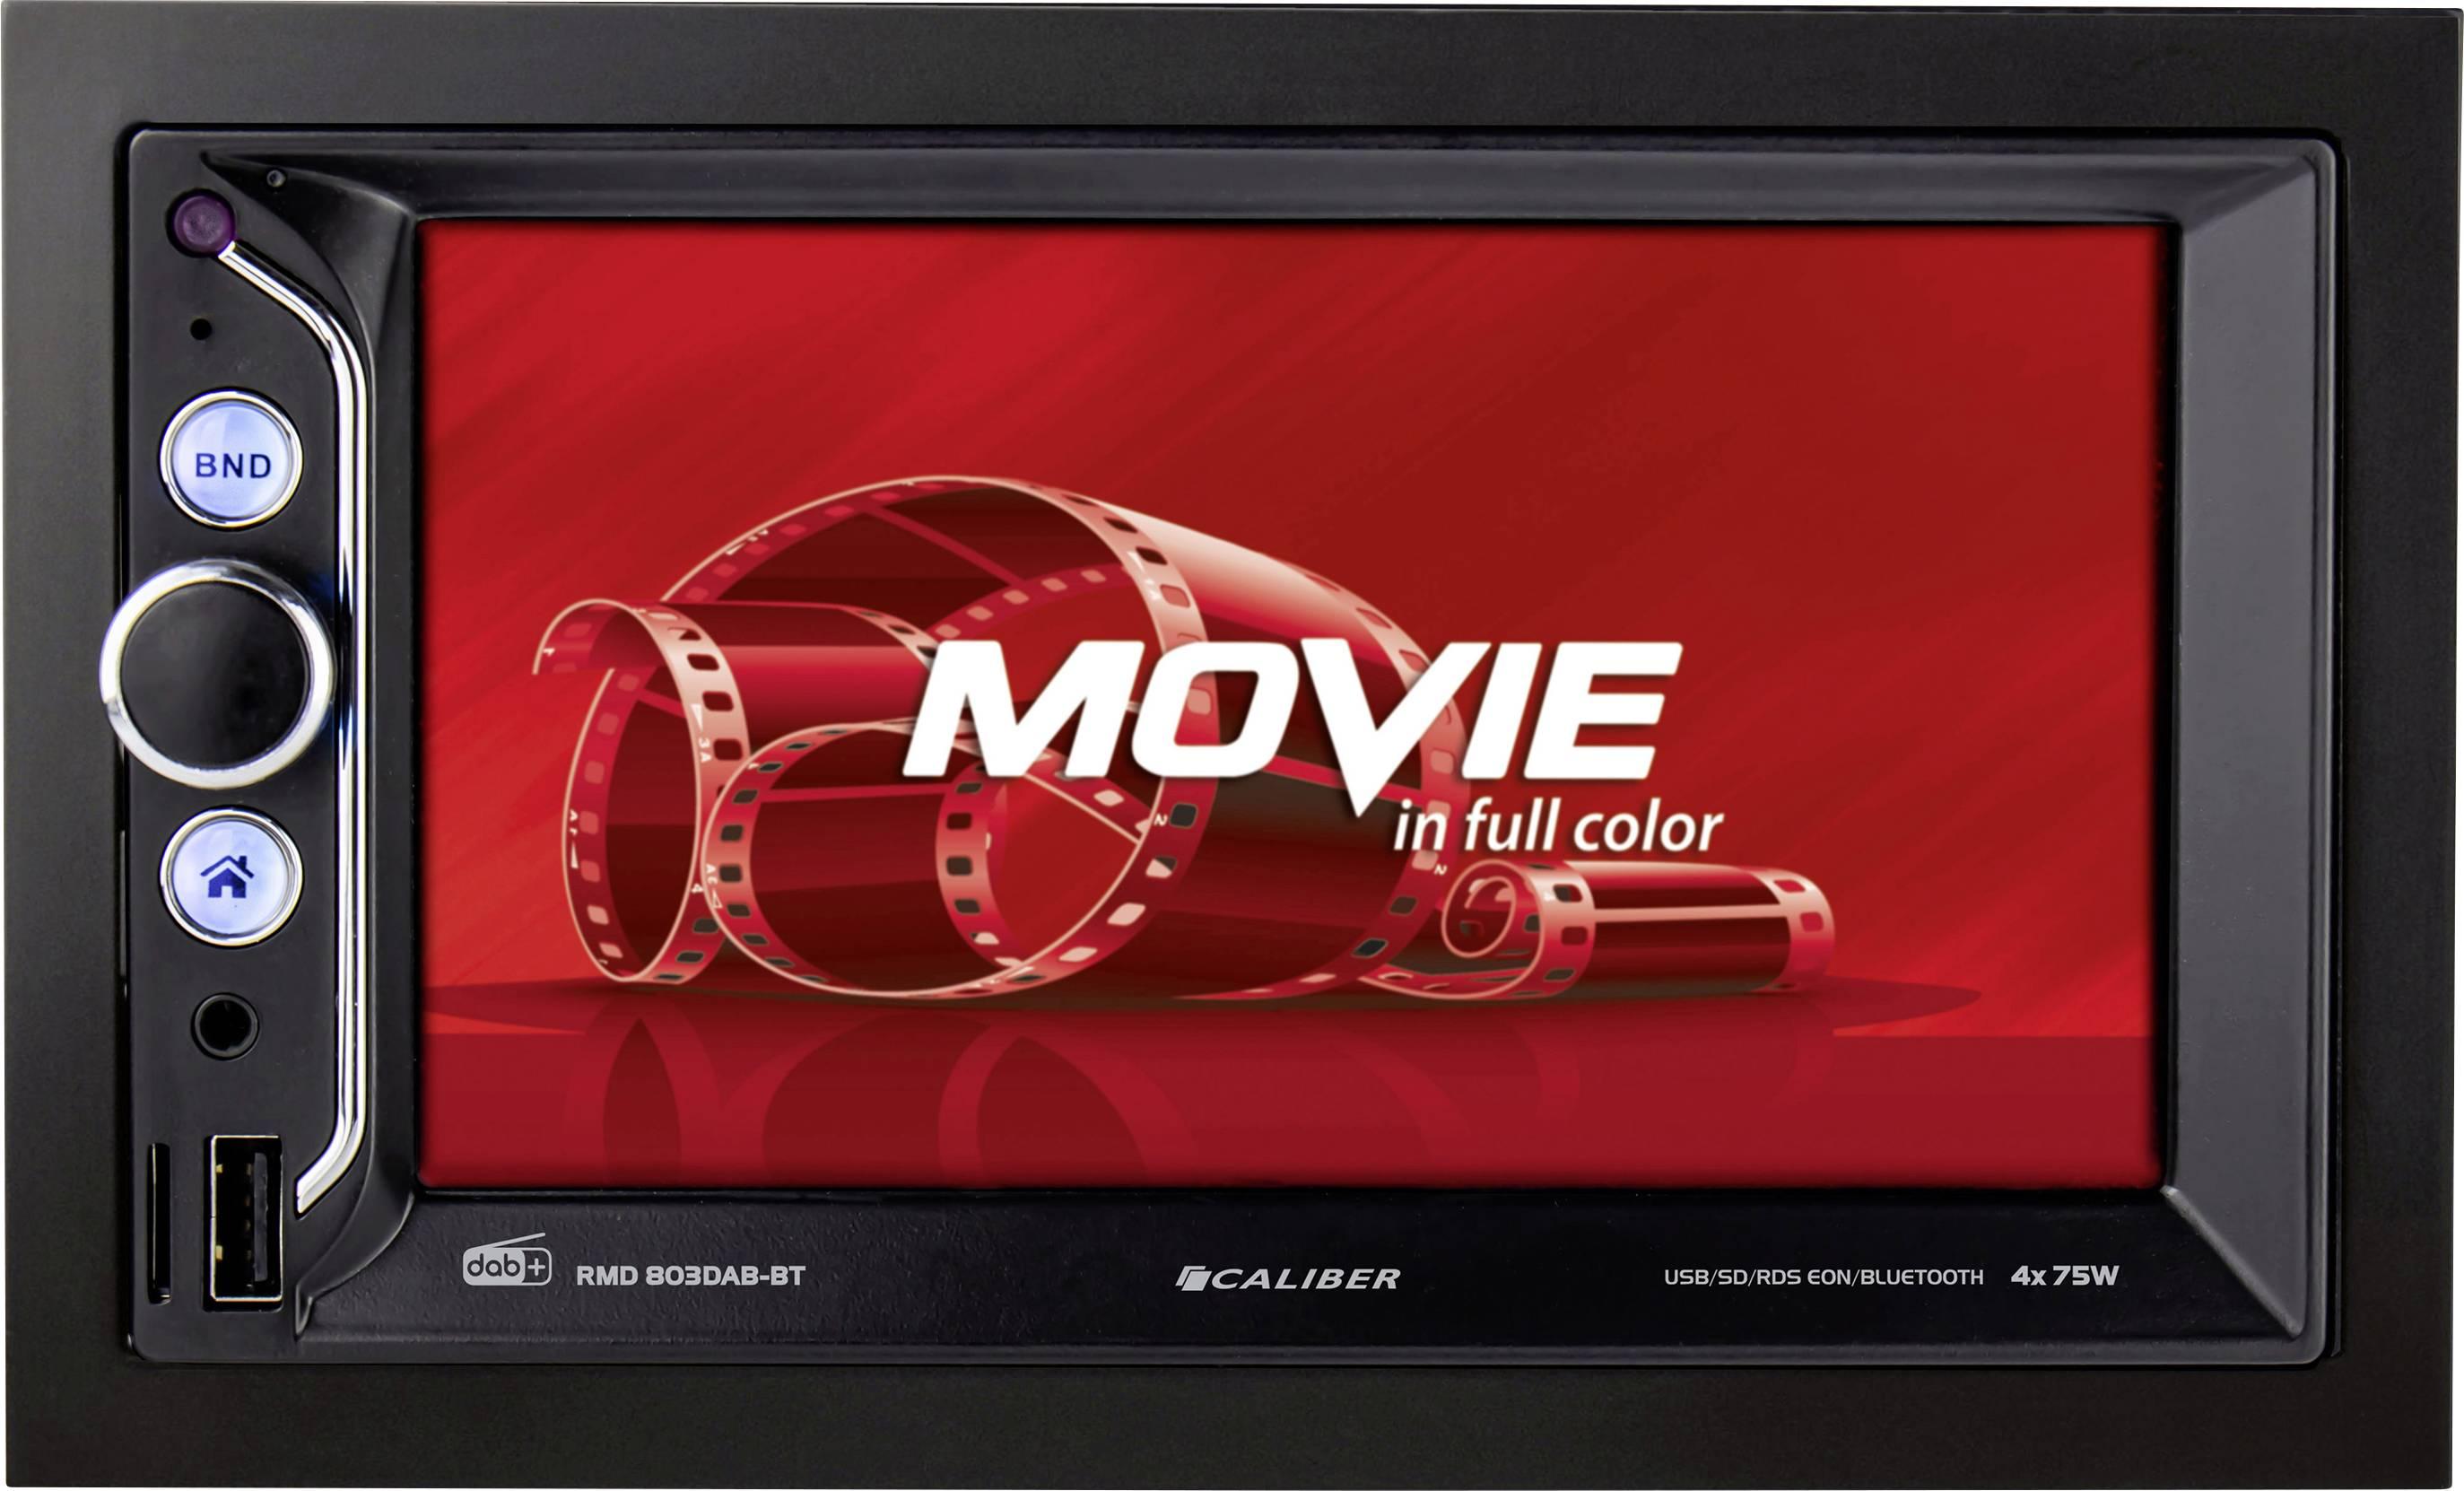 Conrad-Caliber Audio Technology RMD803DAB-BT Autoradio met scherm Aansluiting voor achteruitrijcamera, Bluetooth handsfree, DAB+ tuner, Incl. DAB-antenne, Incl. afstandsbediening-aanbieding